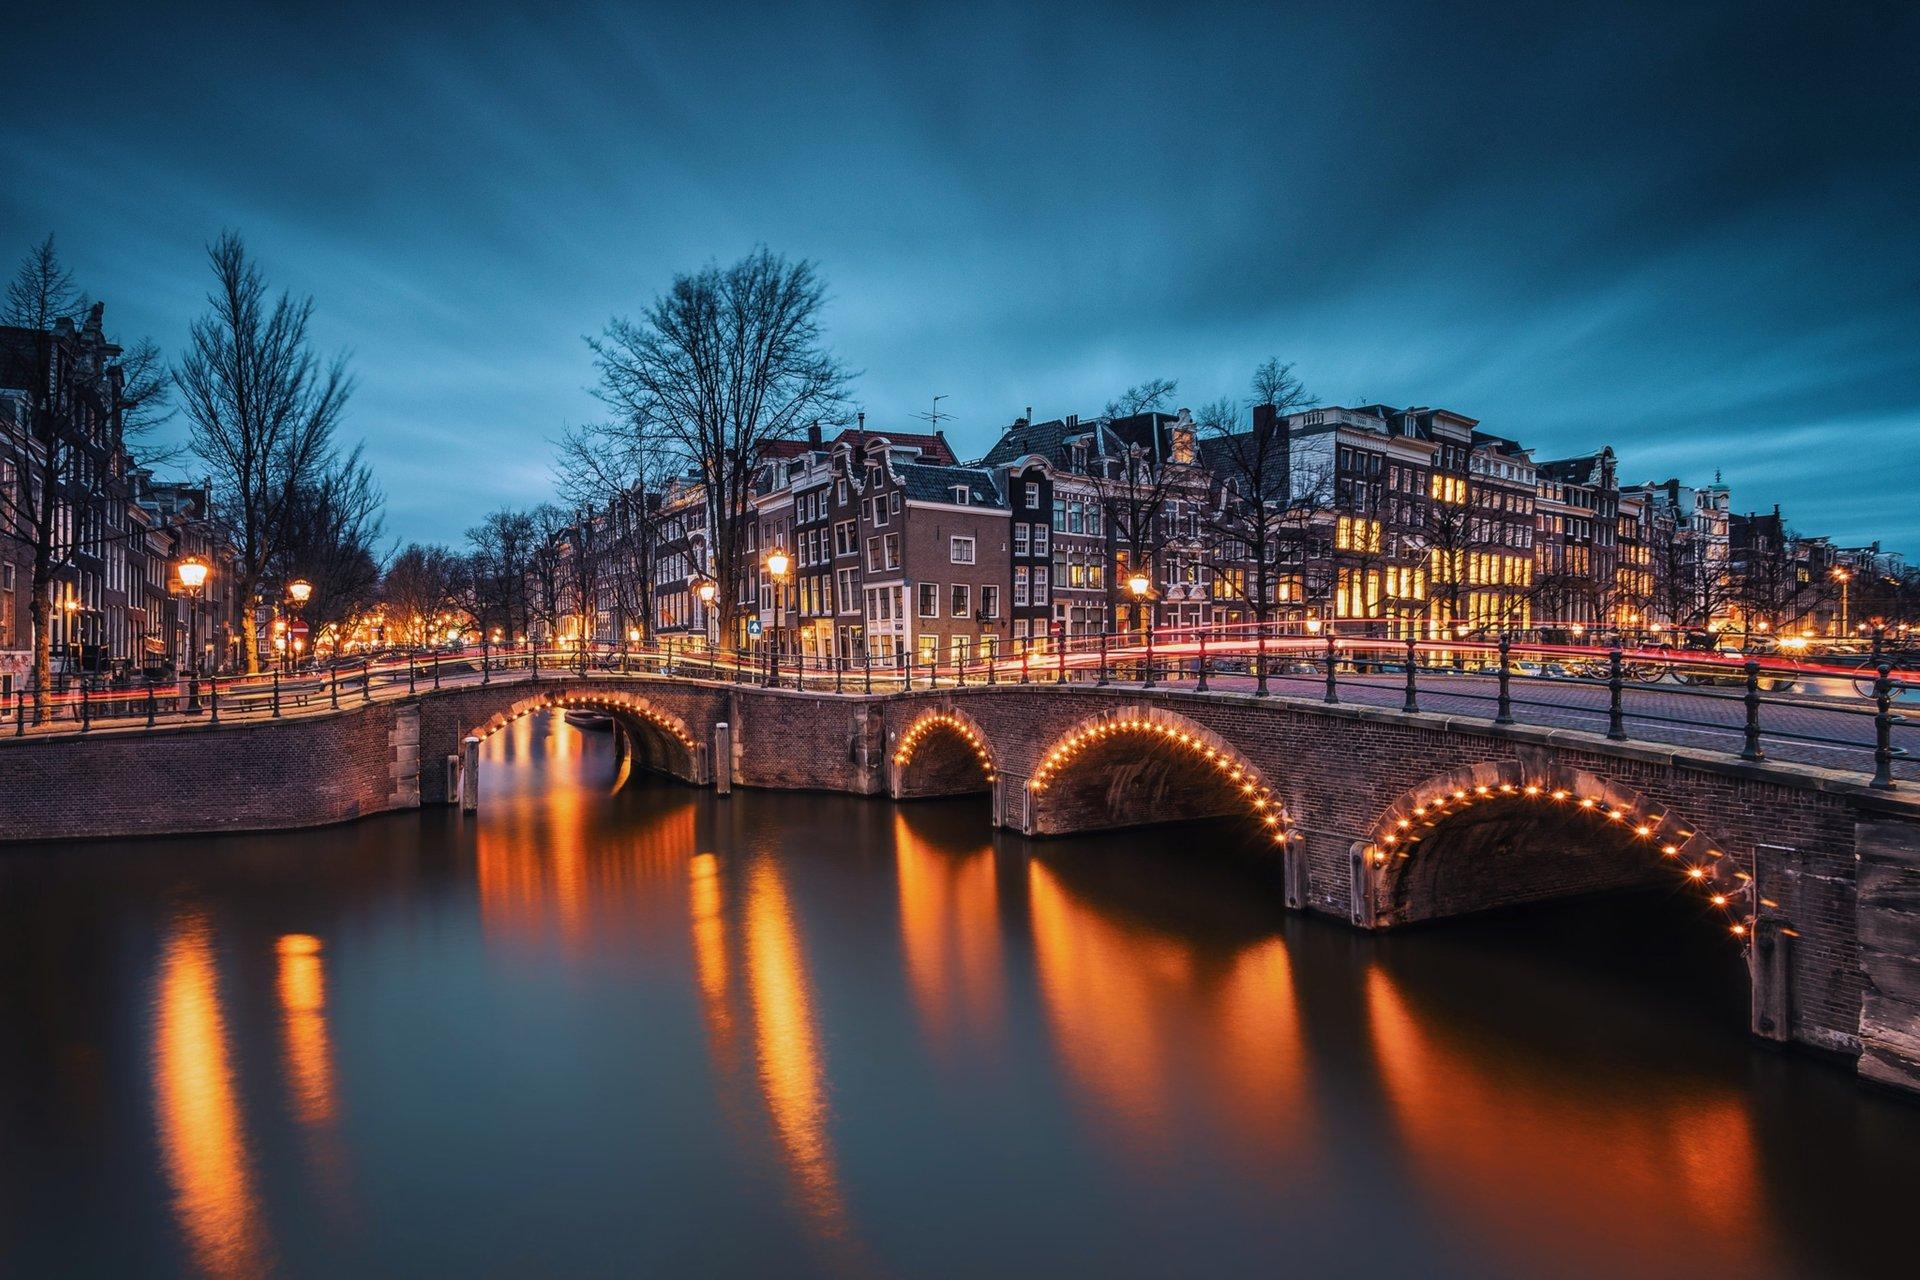 Man Made - Amsterdam  Emperor's Canal Building Light Evening River City Nederland Wallpaper